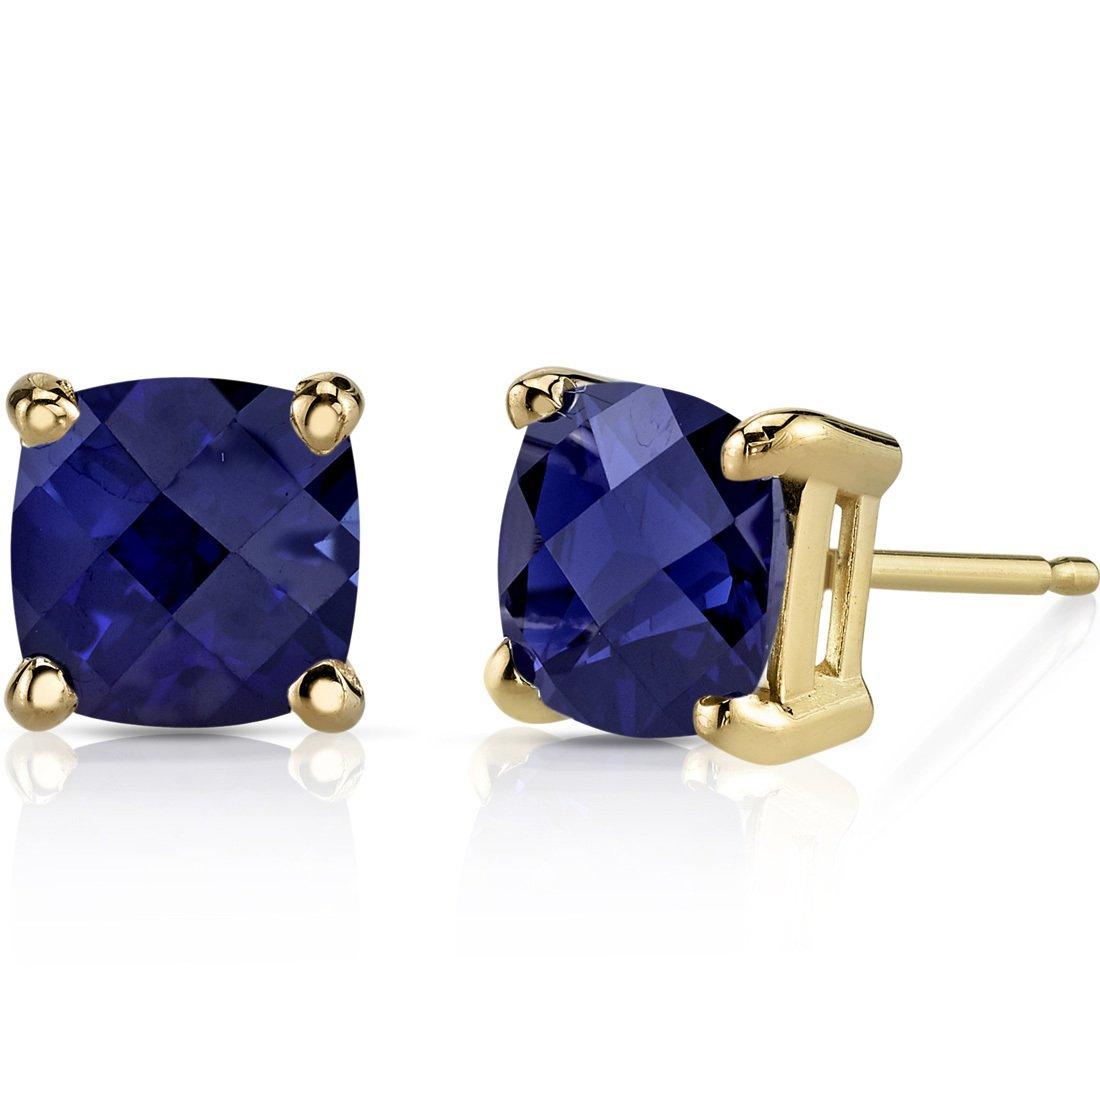 14K 14ct Yellow Gold 2 Ct Lab Blue Sapphire Stud Earrings Cushion Cut 6 x 6 mm